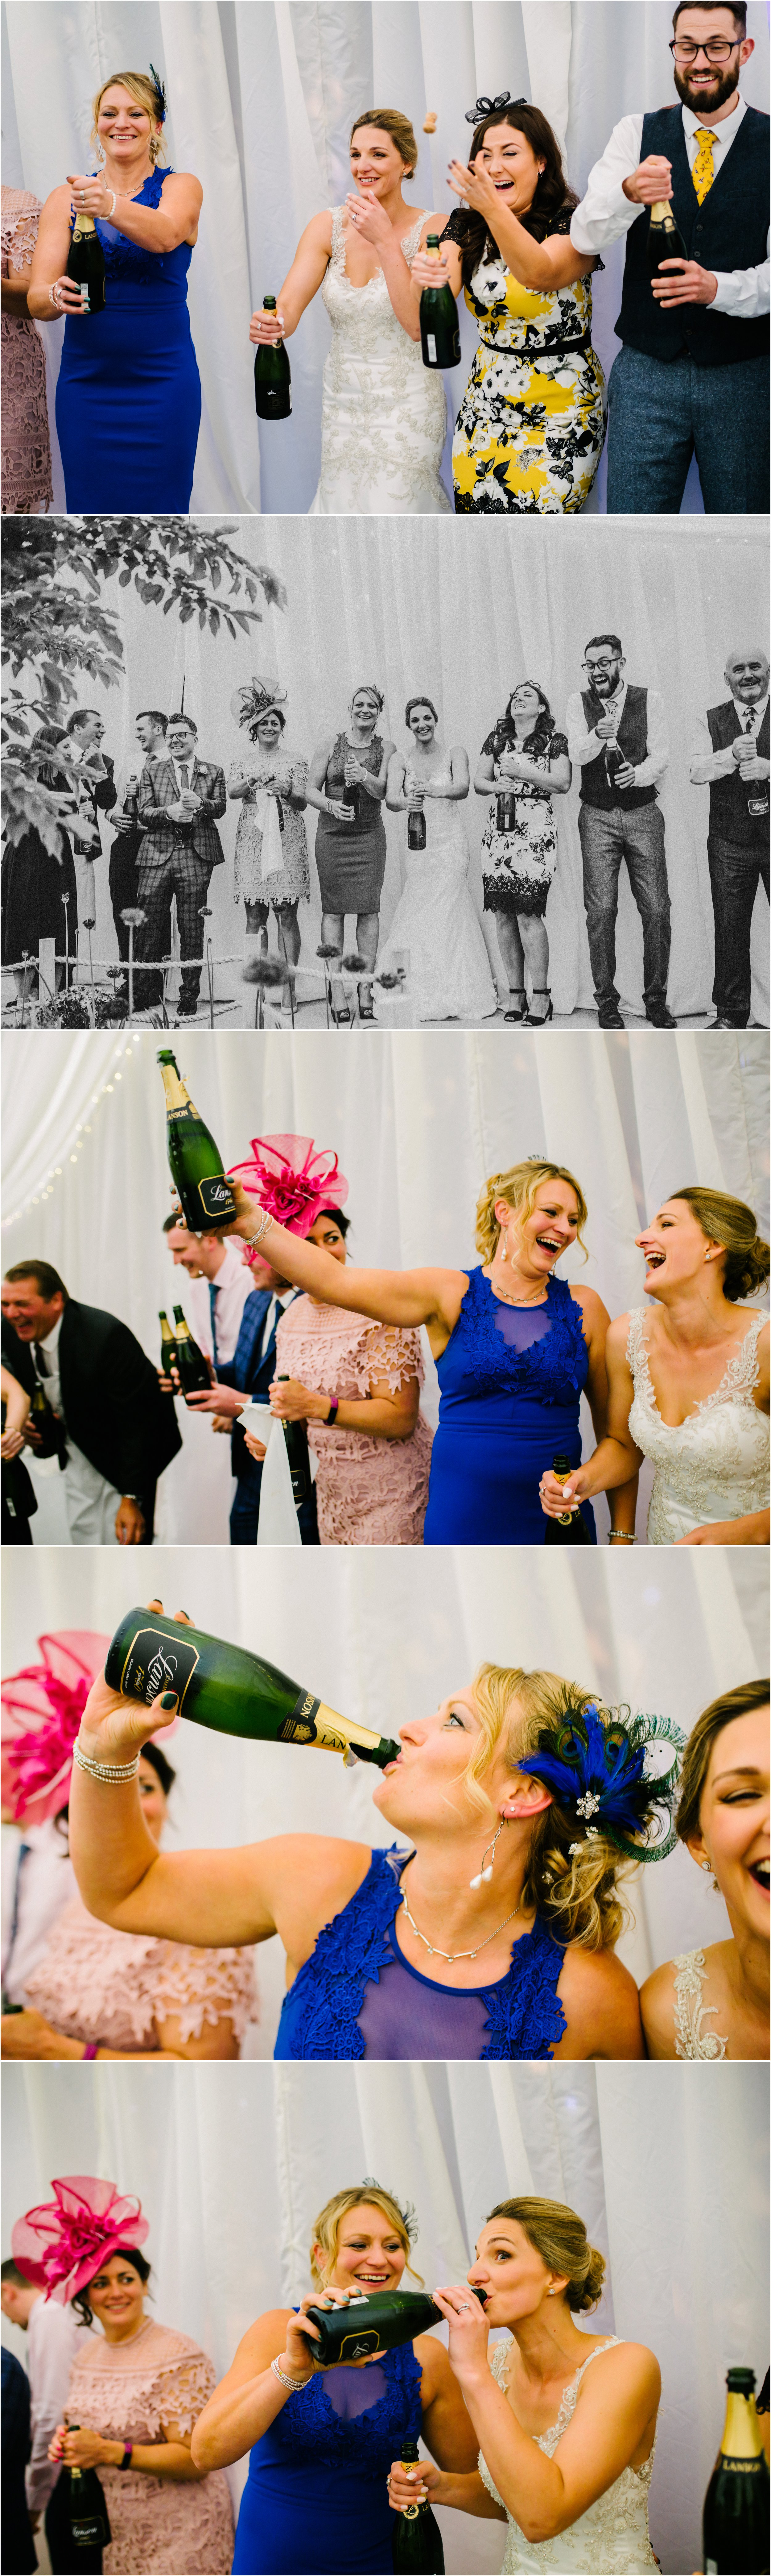 Lincolnshire wedding photography_0139.jpg